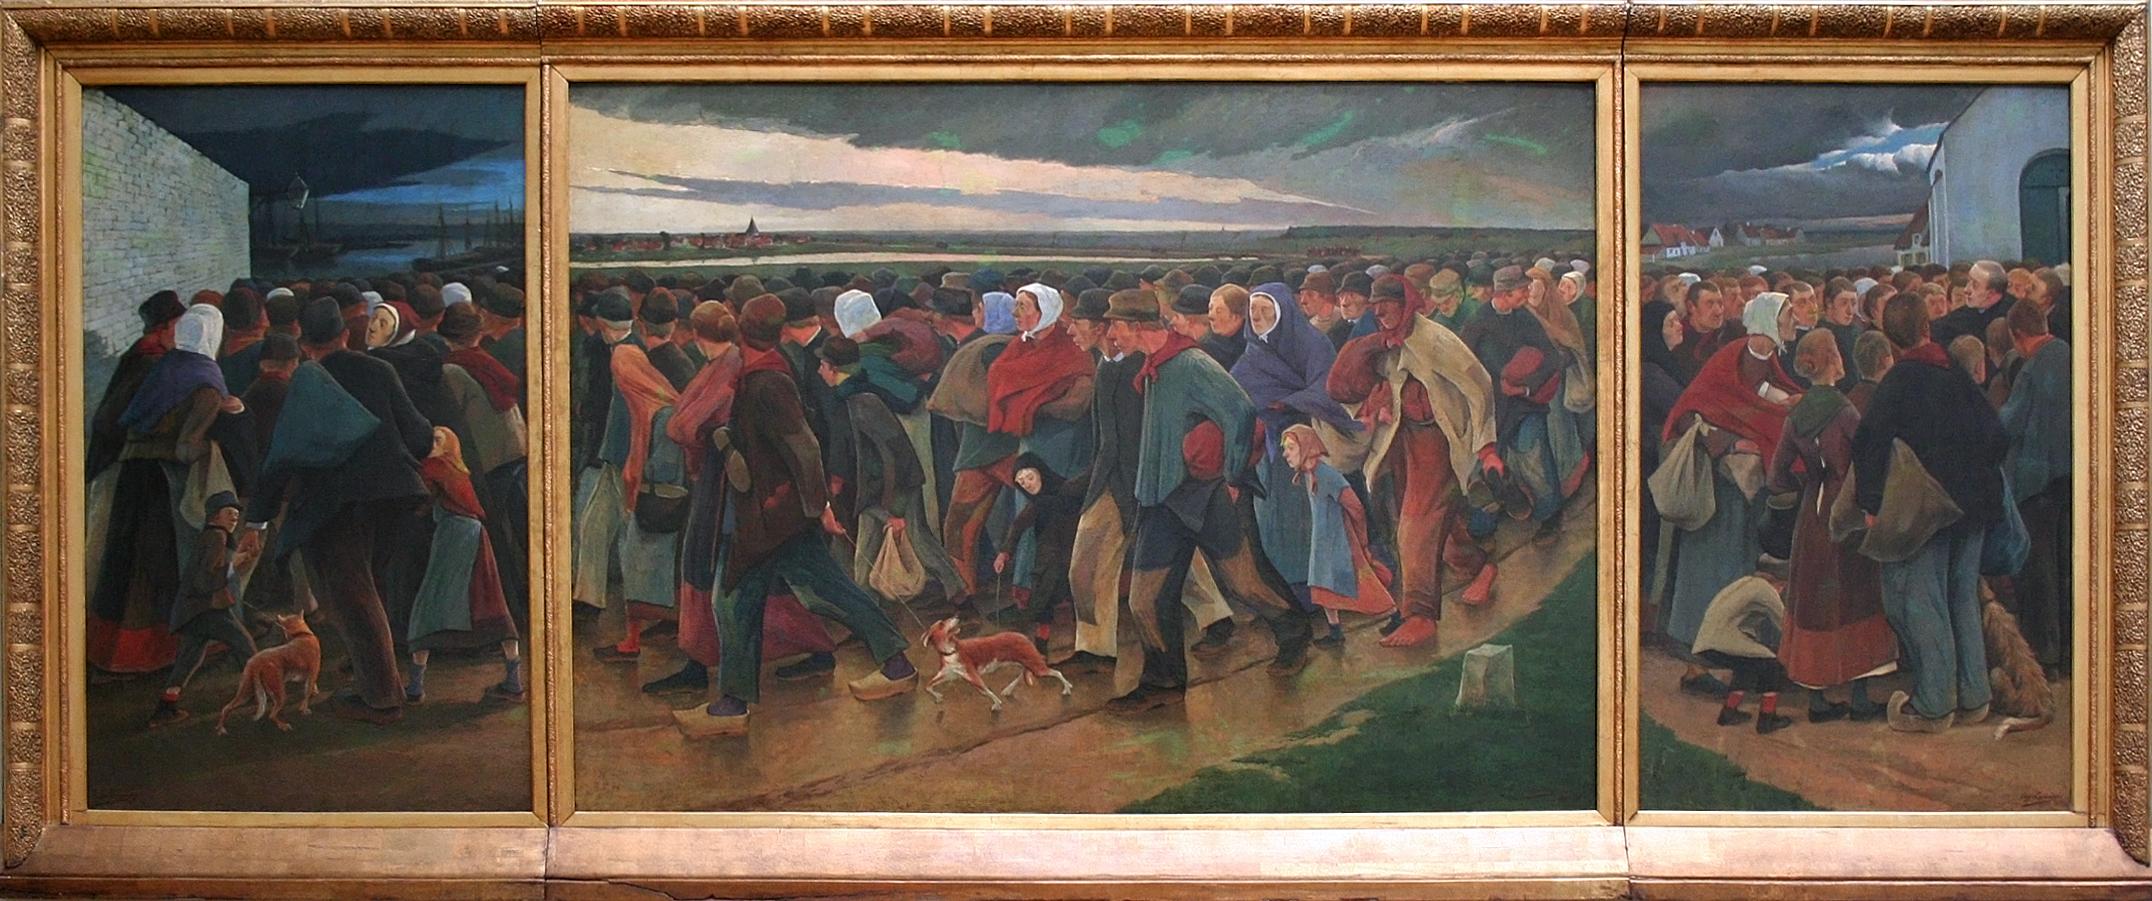 Bestand:Eugène Laermans - Landverhuizers.JPG - Wikipedia